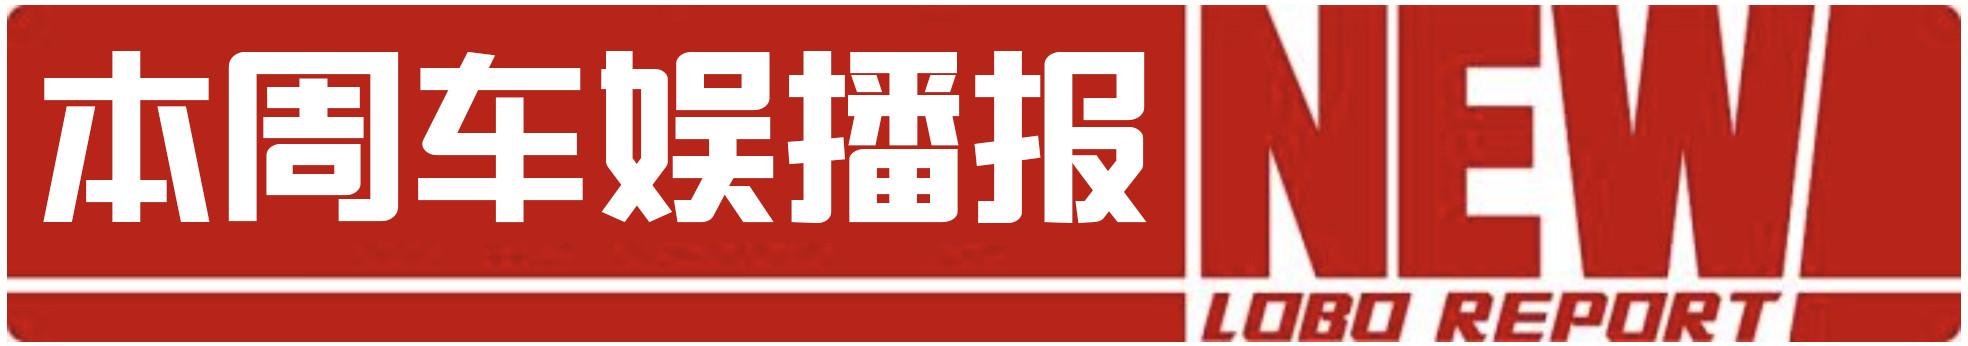 CR-V日子不好过了...全新丰田RAV4 10月份上市!